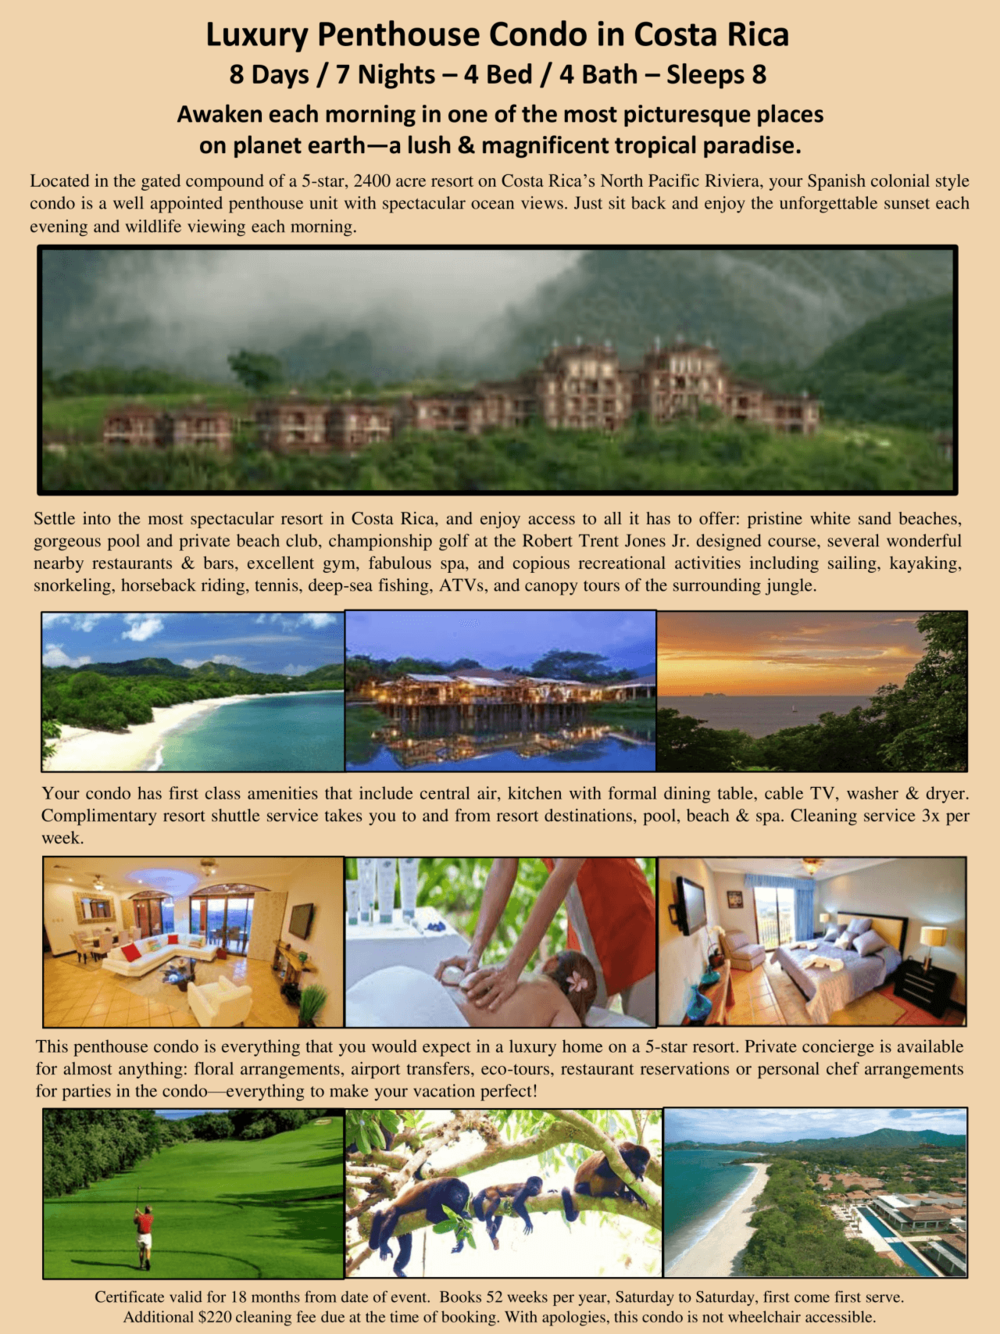 Costa Rica Penthouse Condo